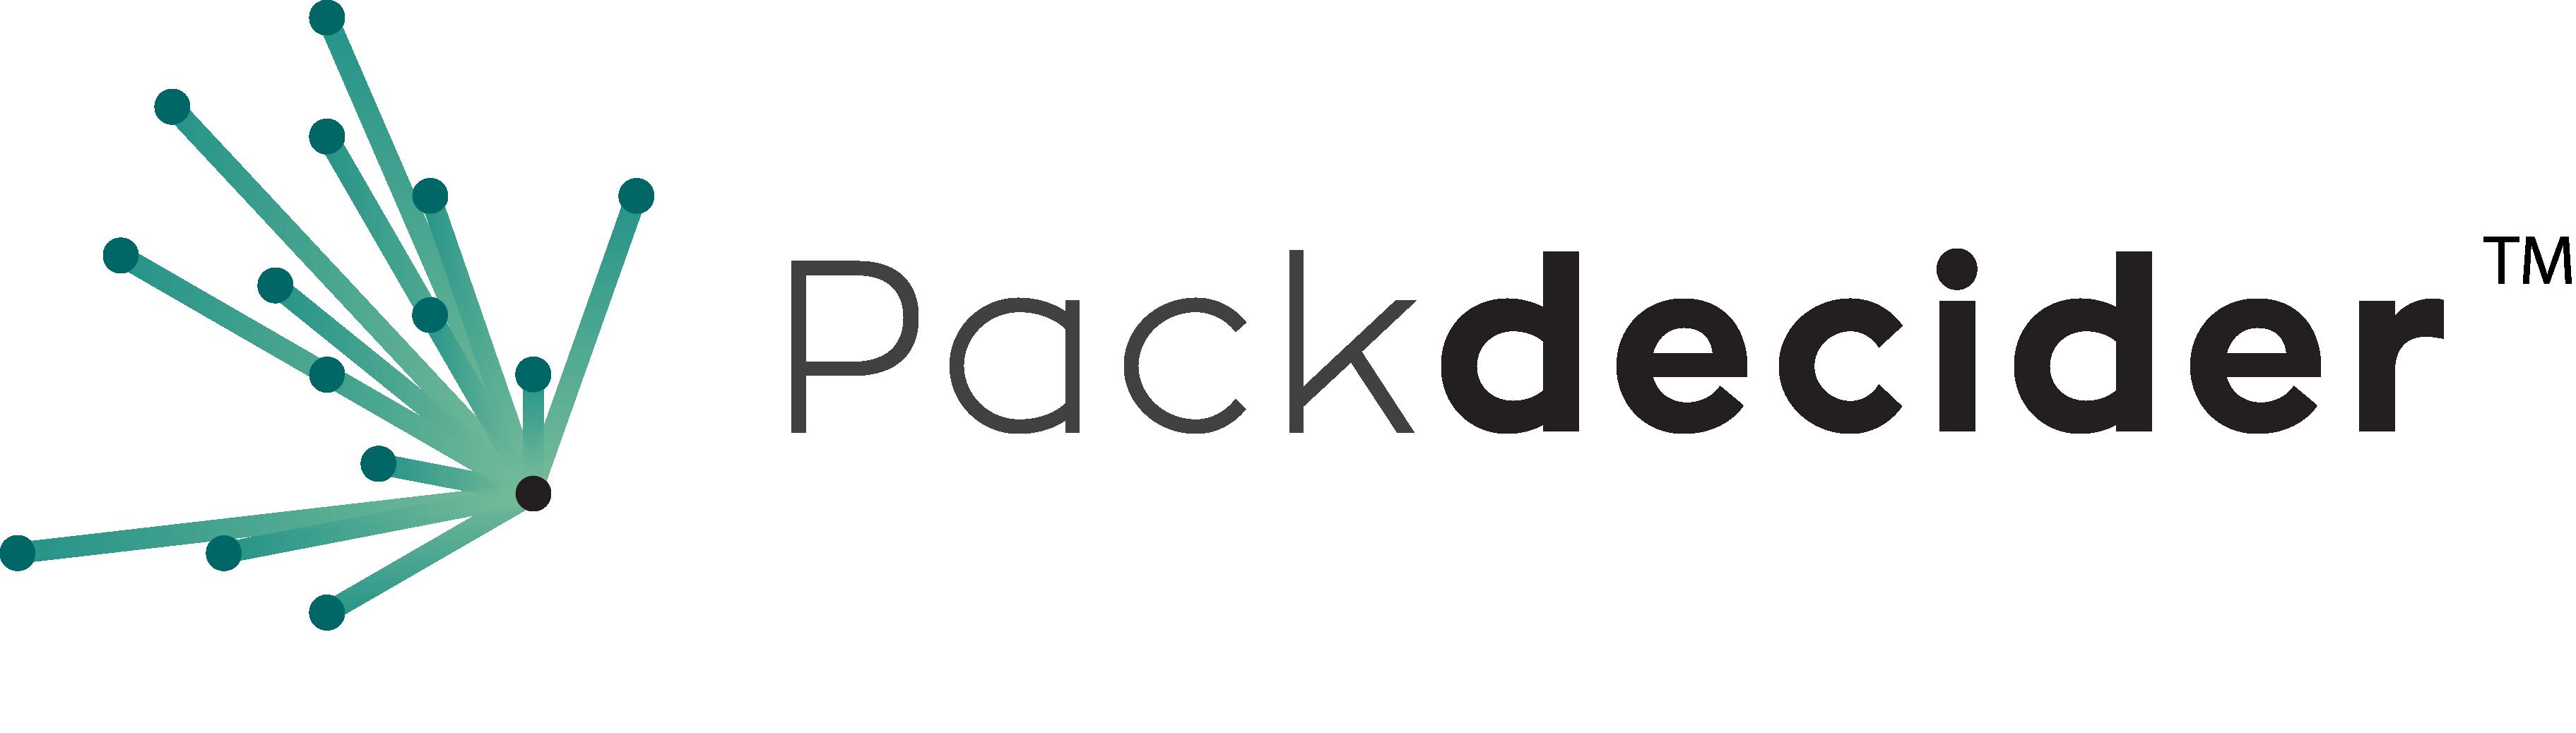 pack-decider.png